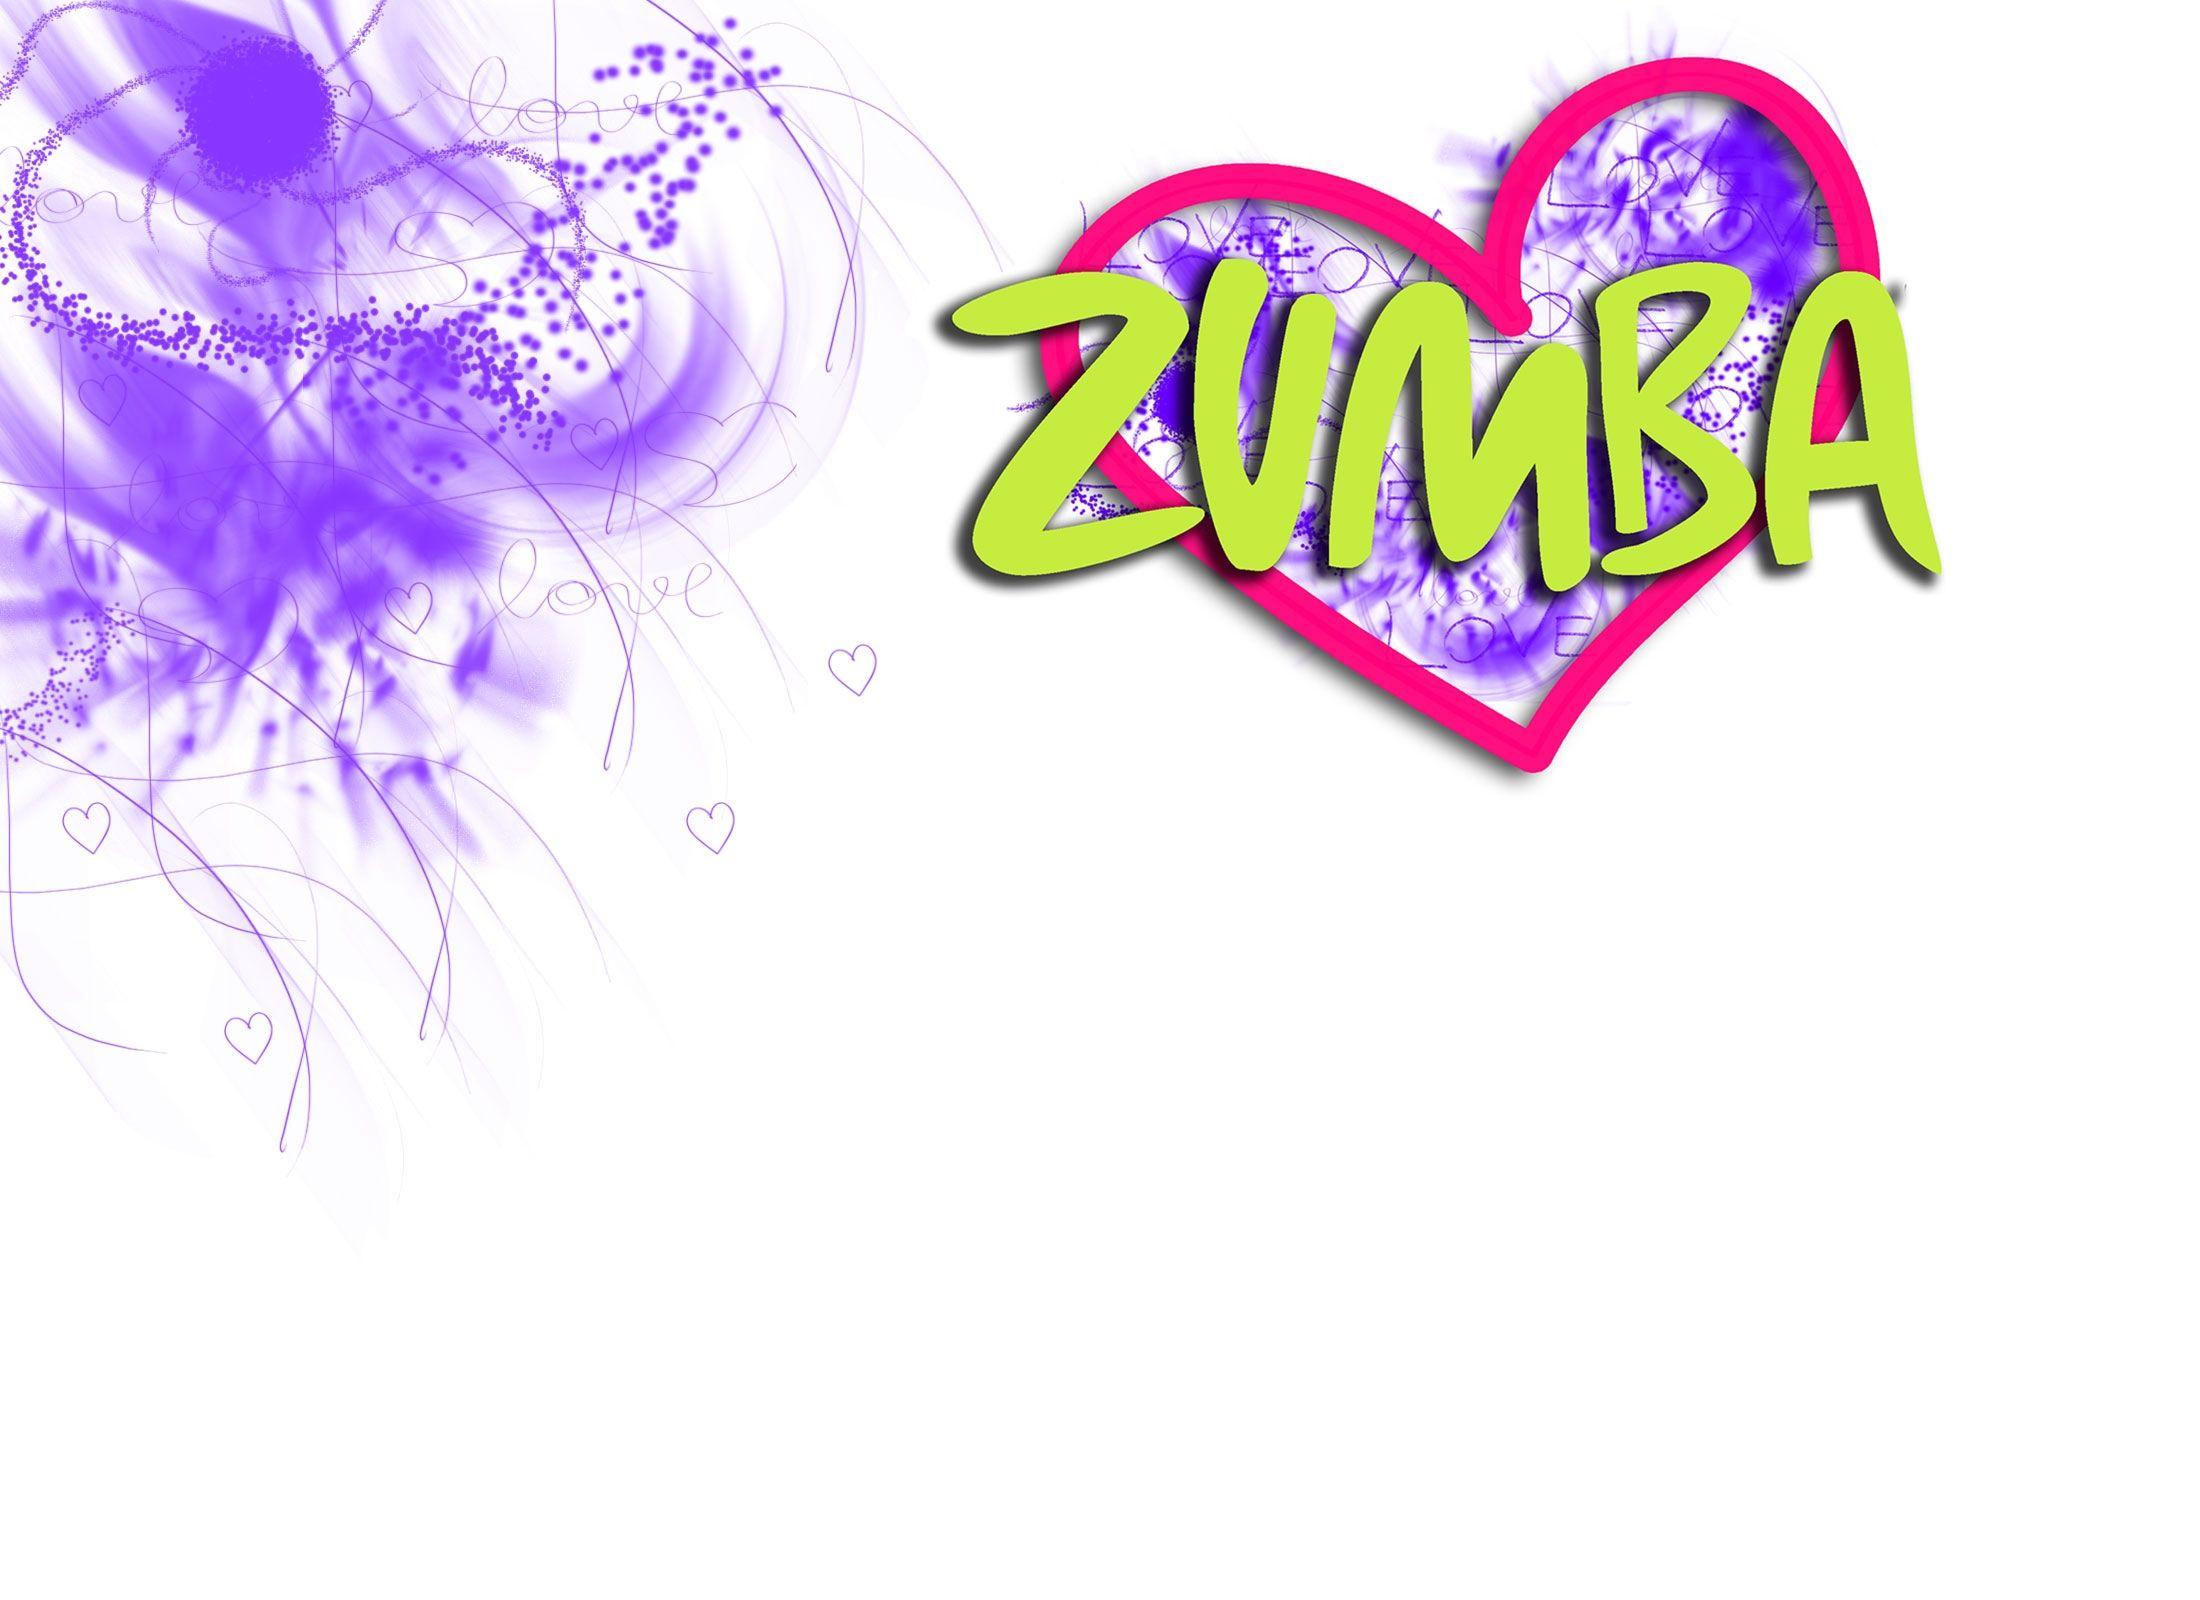 Free Wallpaper Of I Love Zumba Download